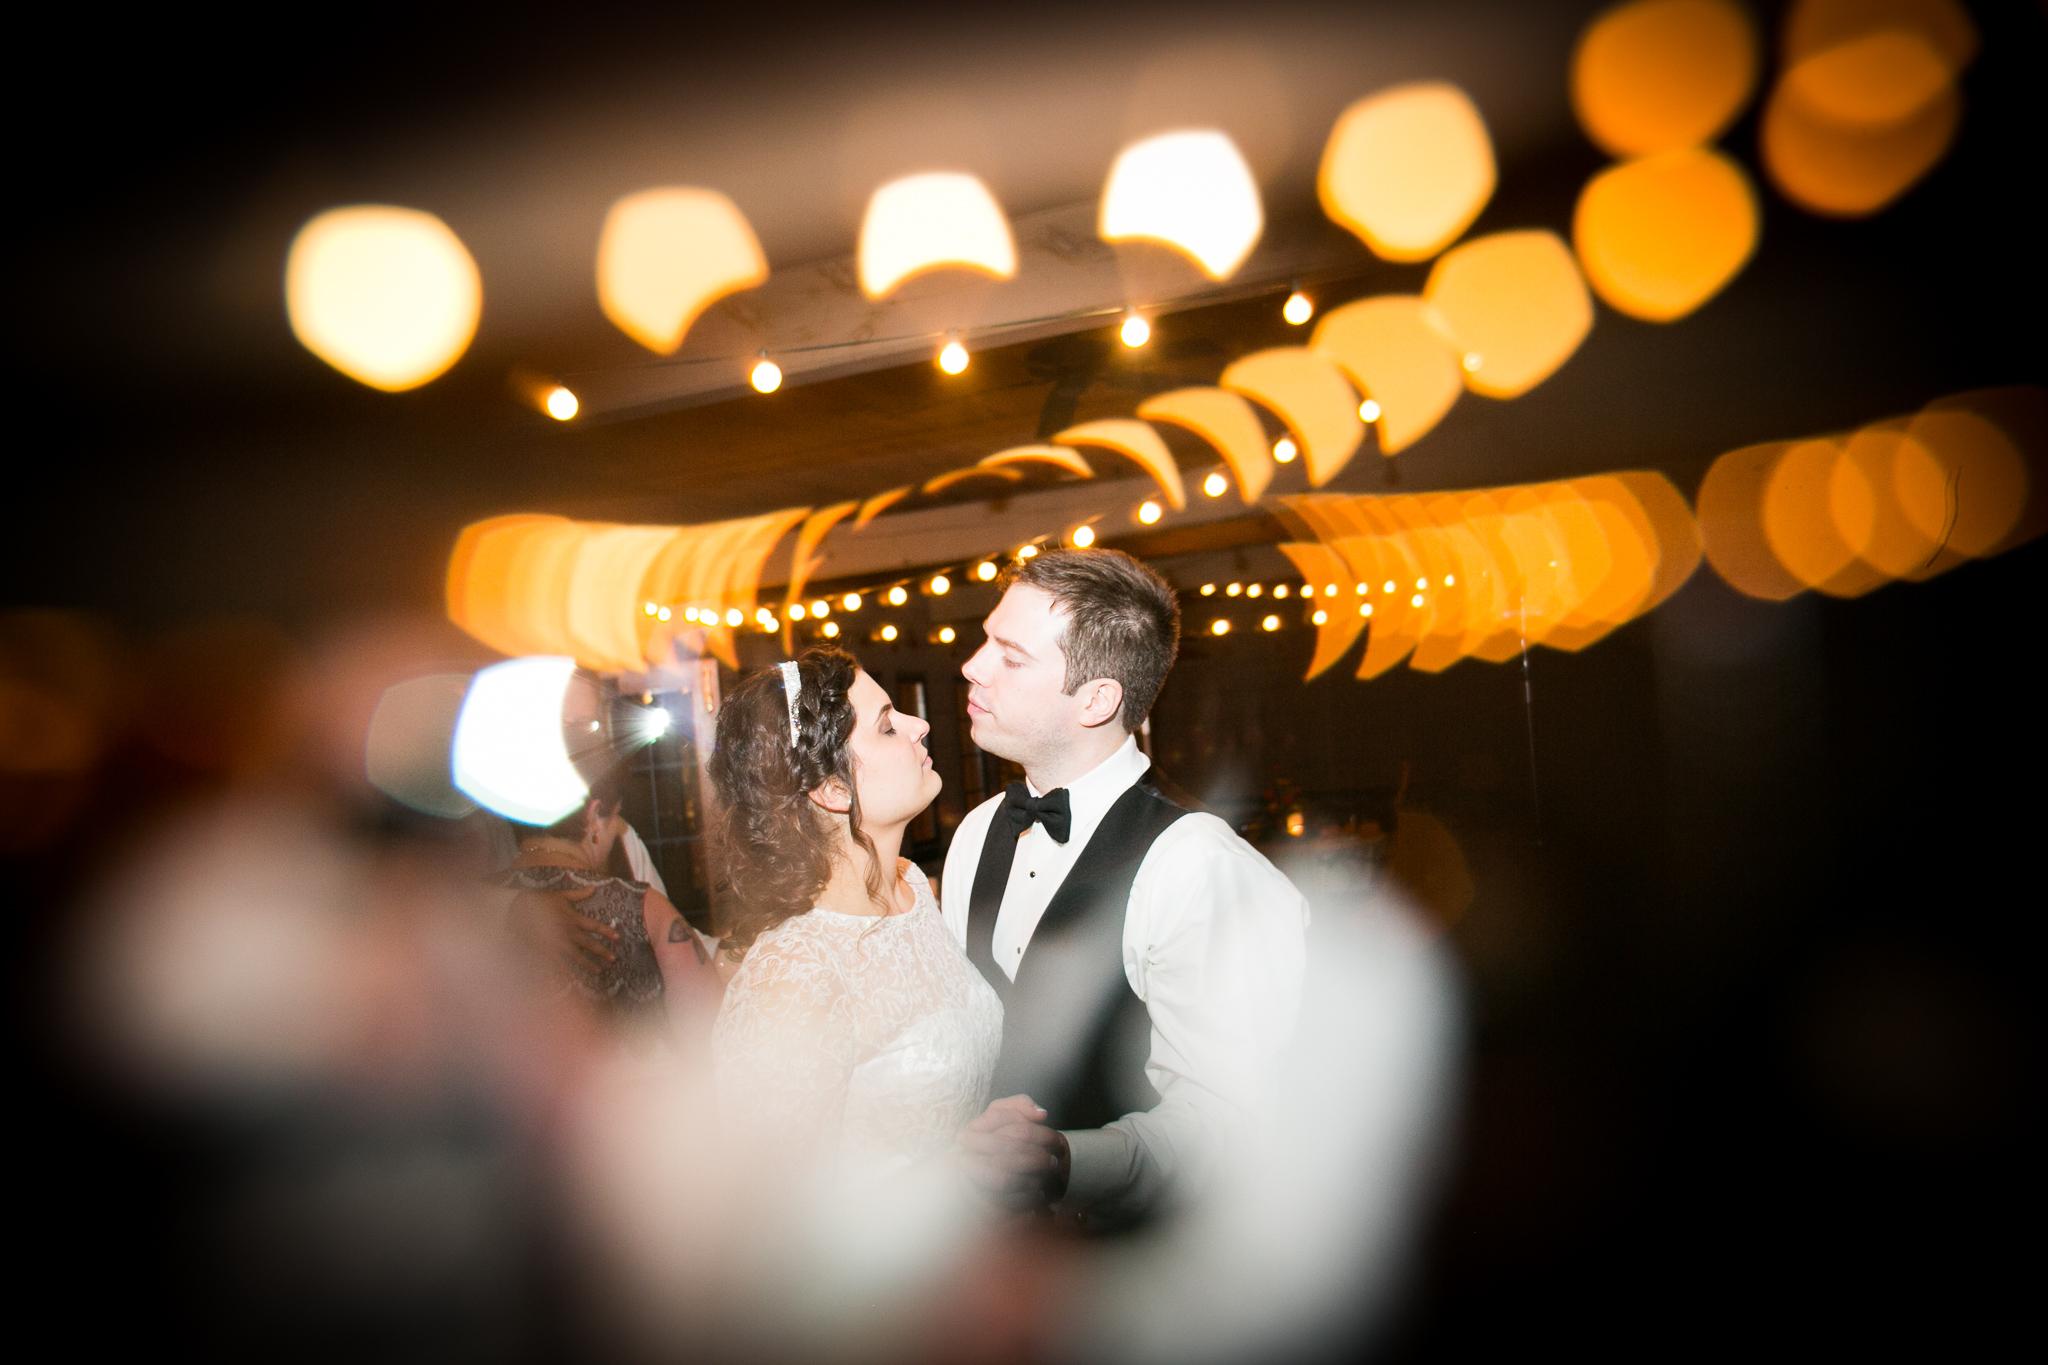 camuglia-whomstudio-chelsea_and_andy-nycphotographer-wedding-brooklyn-buffalo-timberlodge-178-5882.jpg